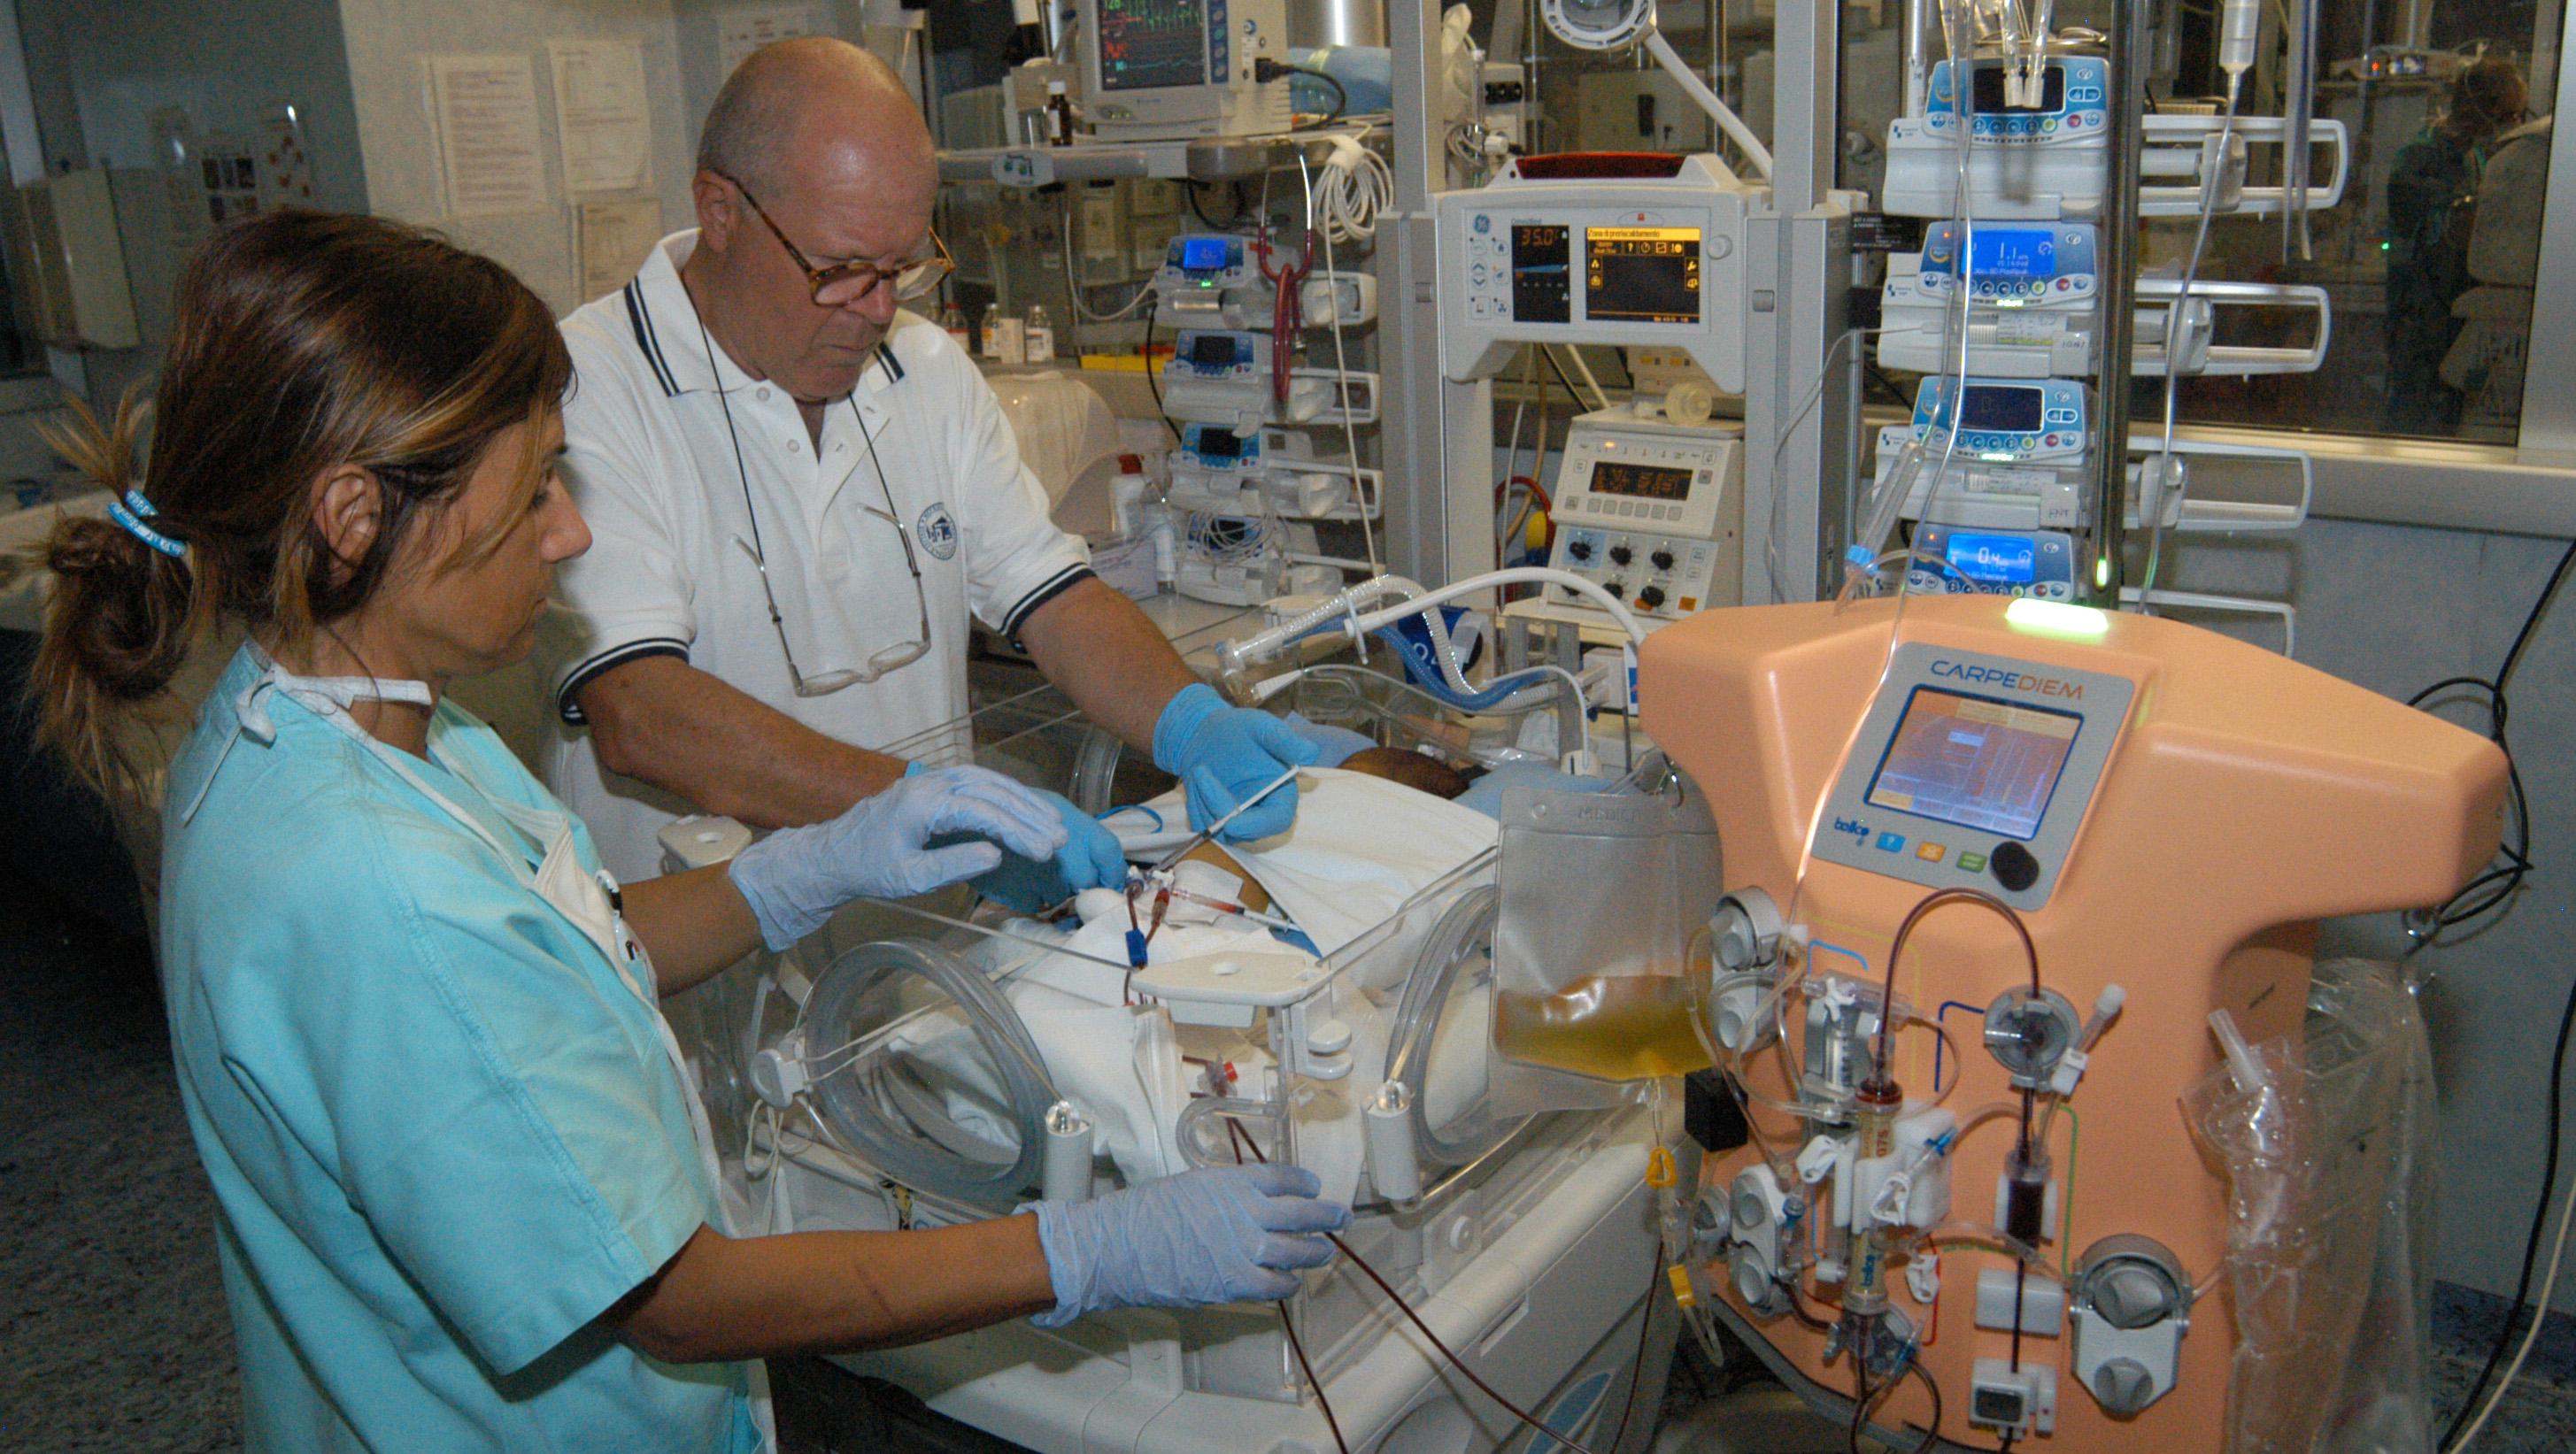 Doctors design mini dialysis machine for babies - CBS News